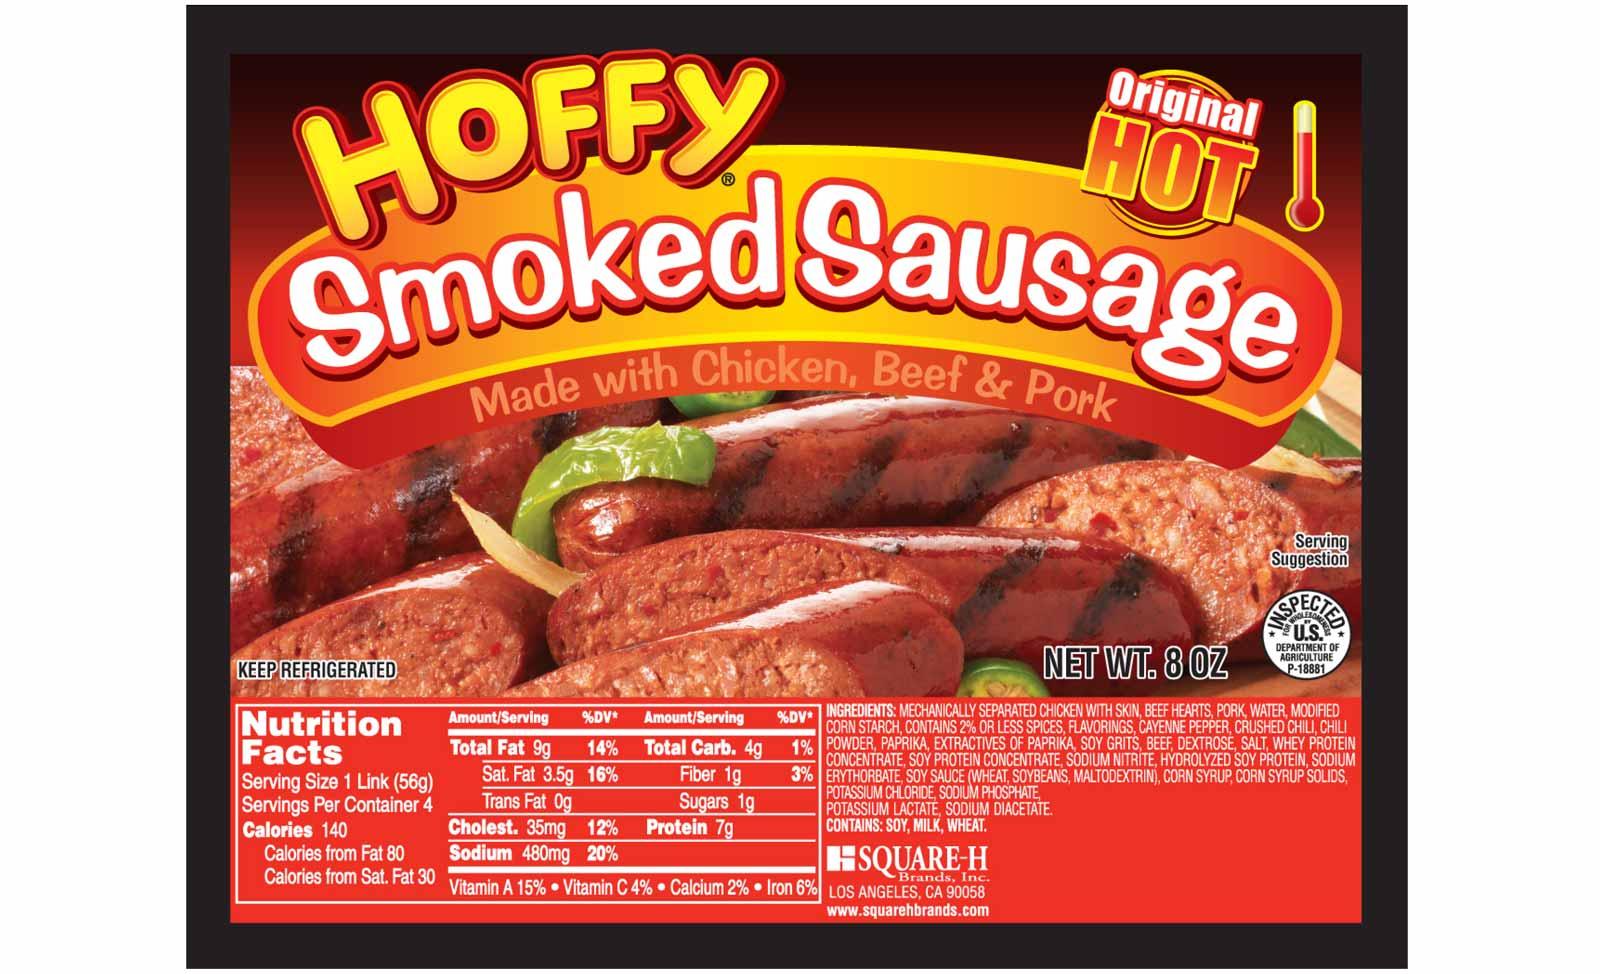 Hoffy Smoked Sausage Packaging